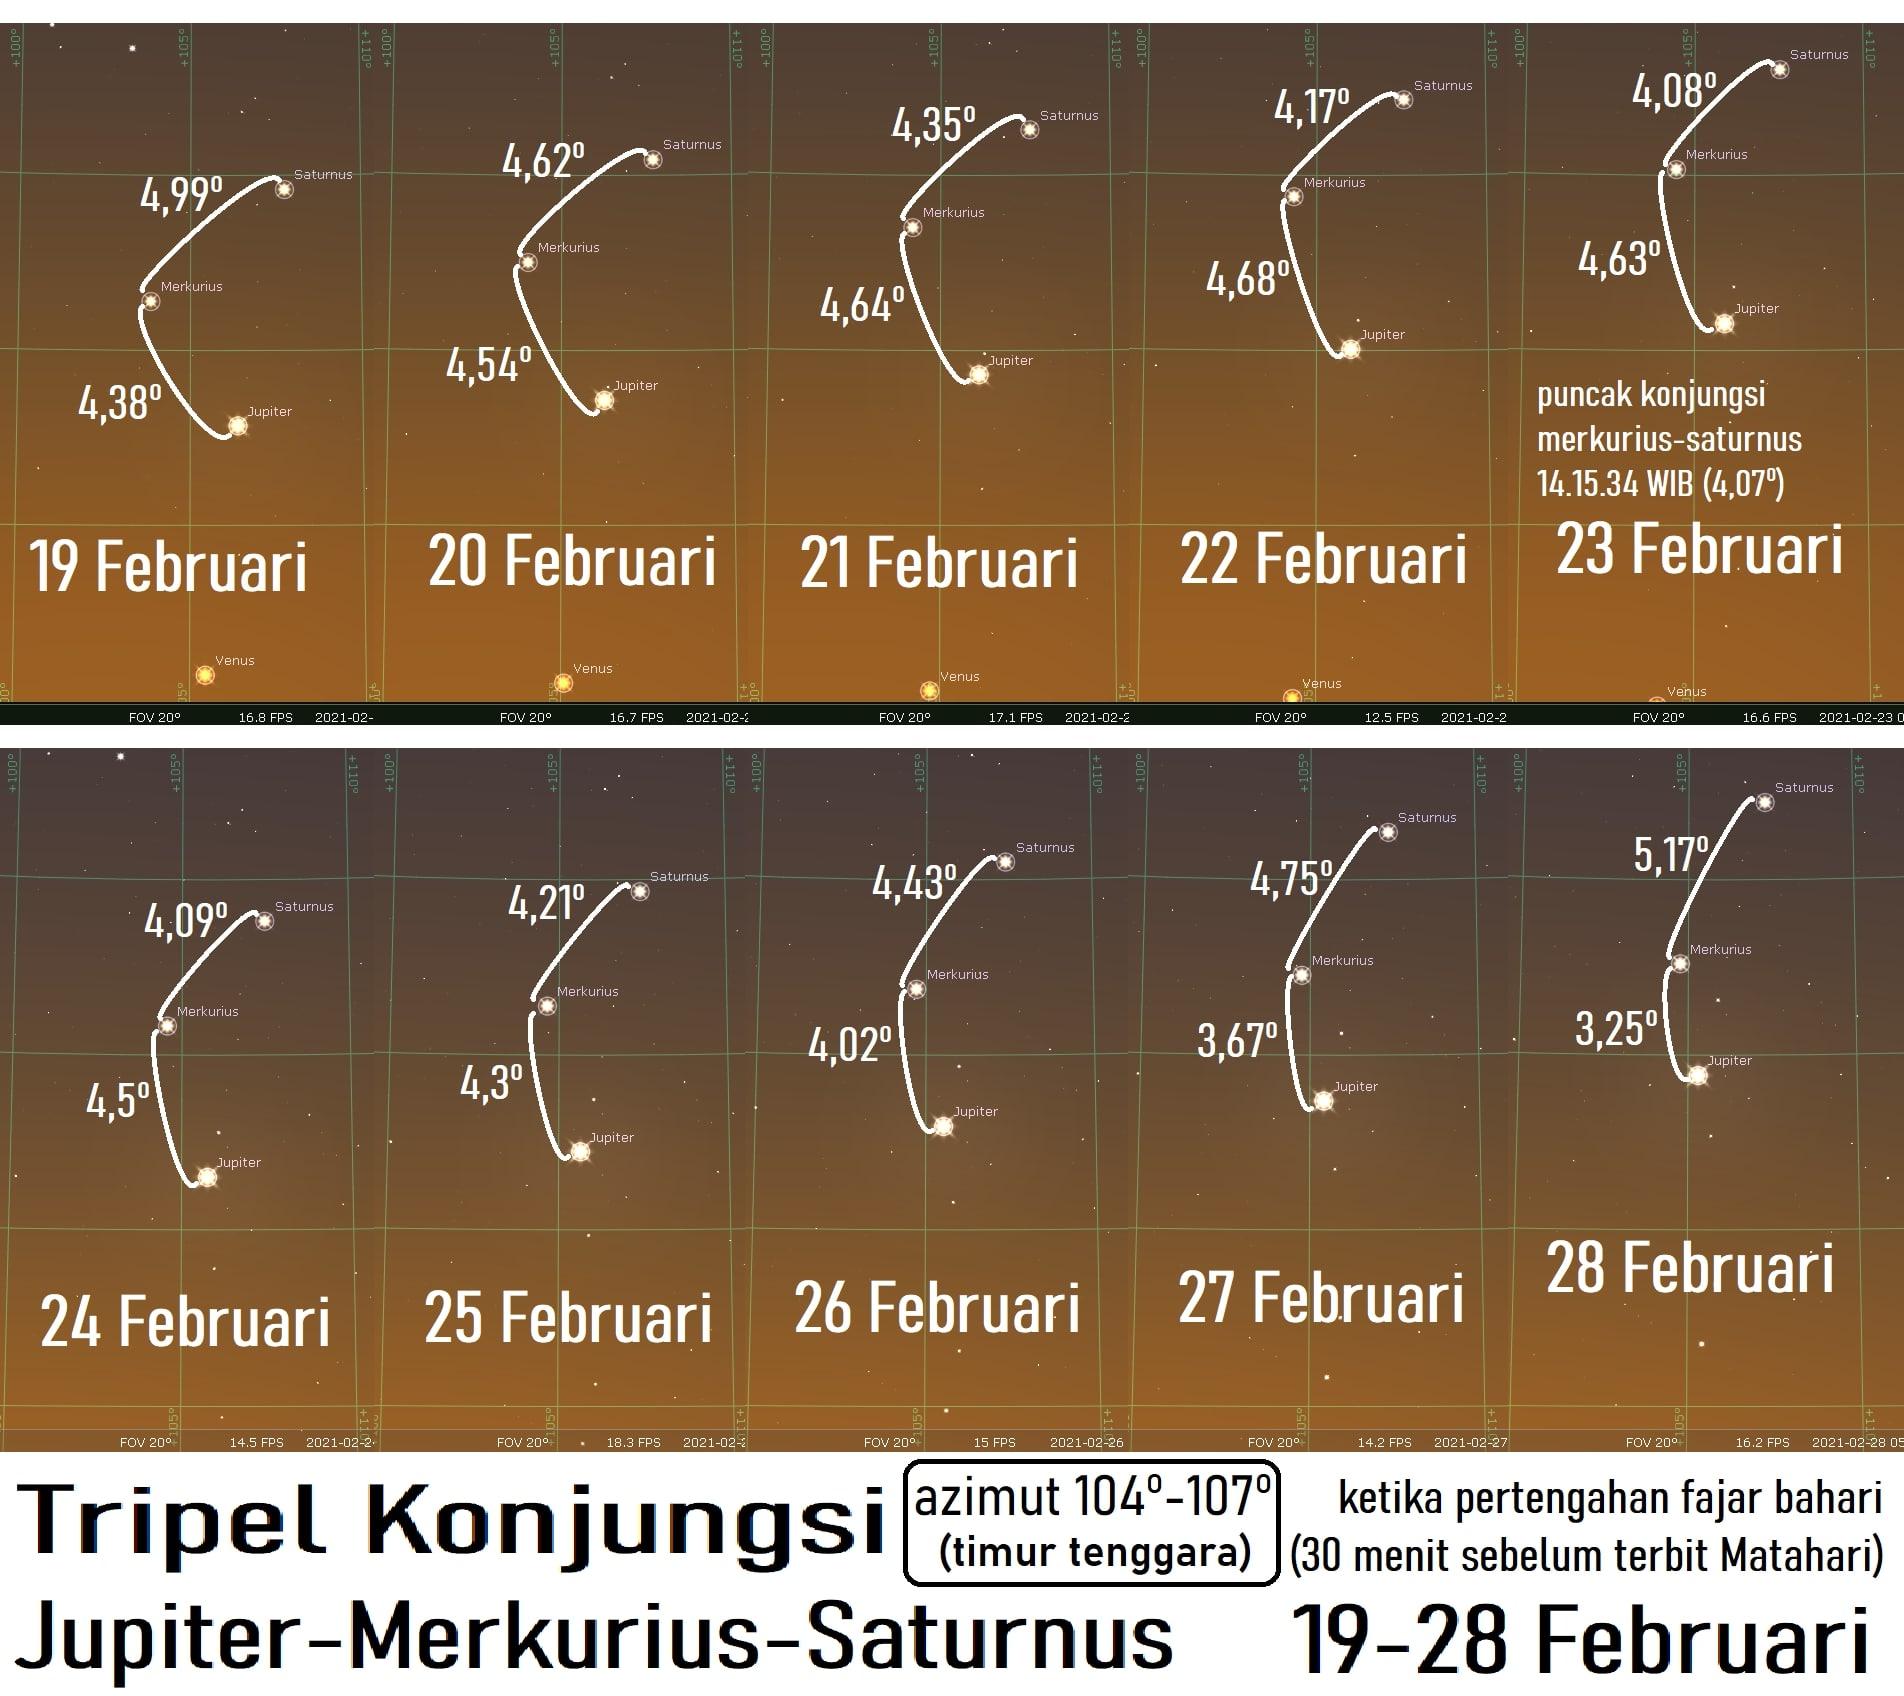 Konjungsi Segitiga Merkurius-Jupiter-Saturnus